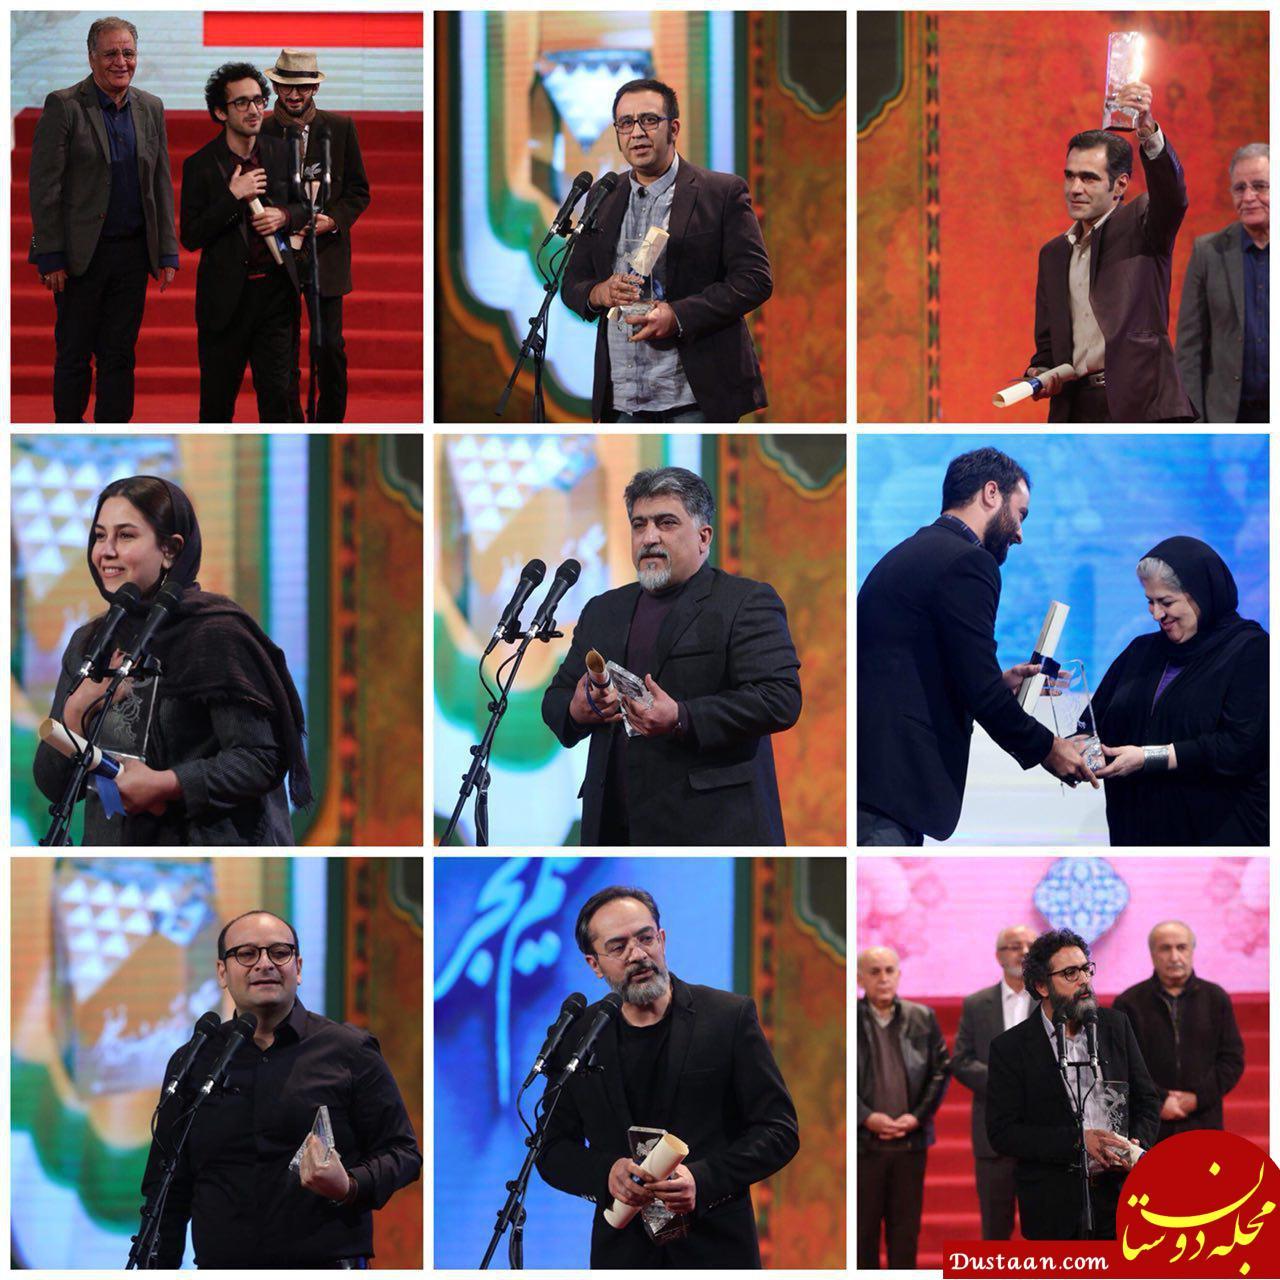 www.dustaan.com گزارش تصویری از اختتامیه جشنواره فیلم فجر 96 +تصاویر